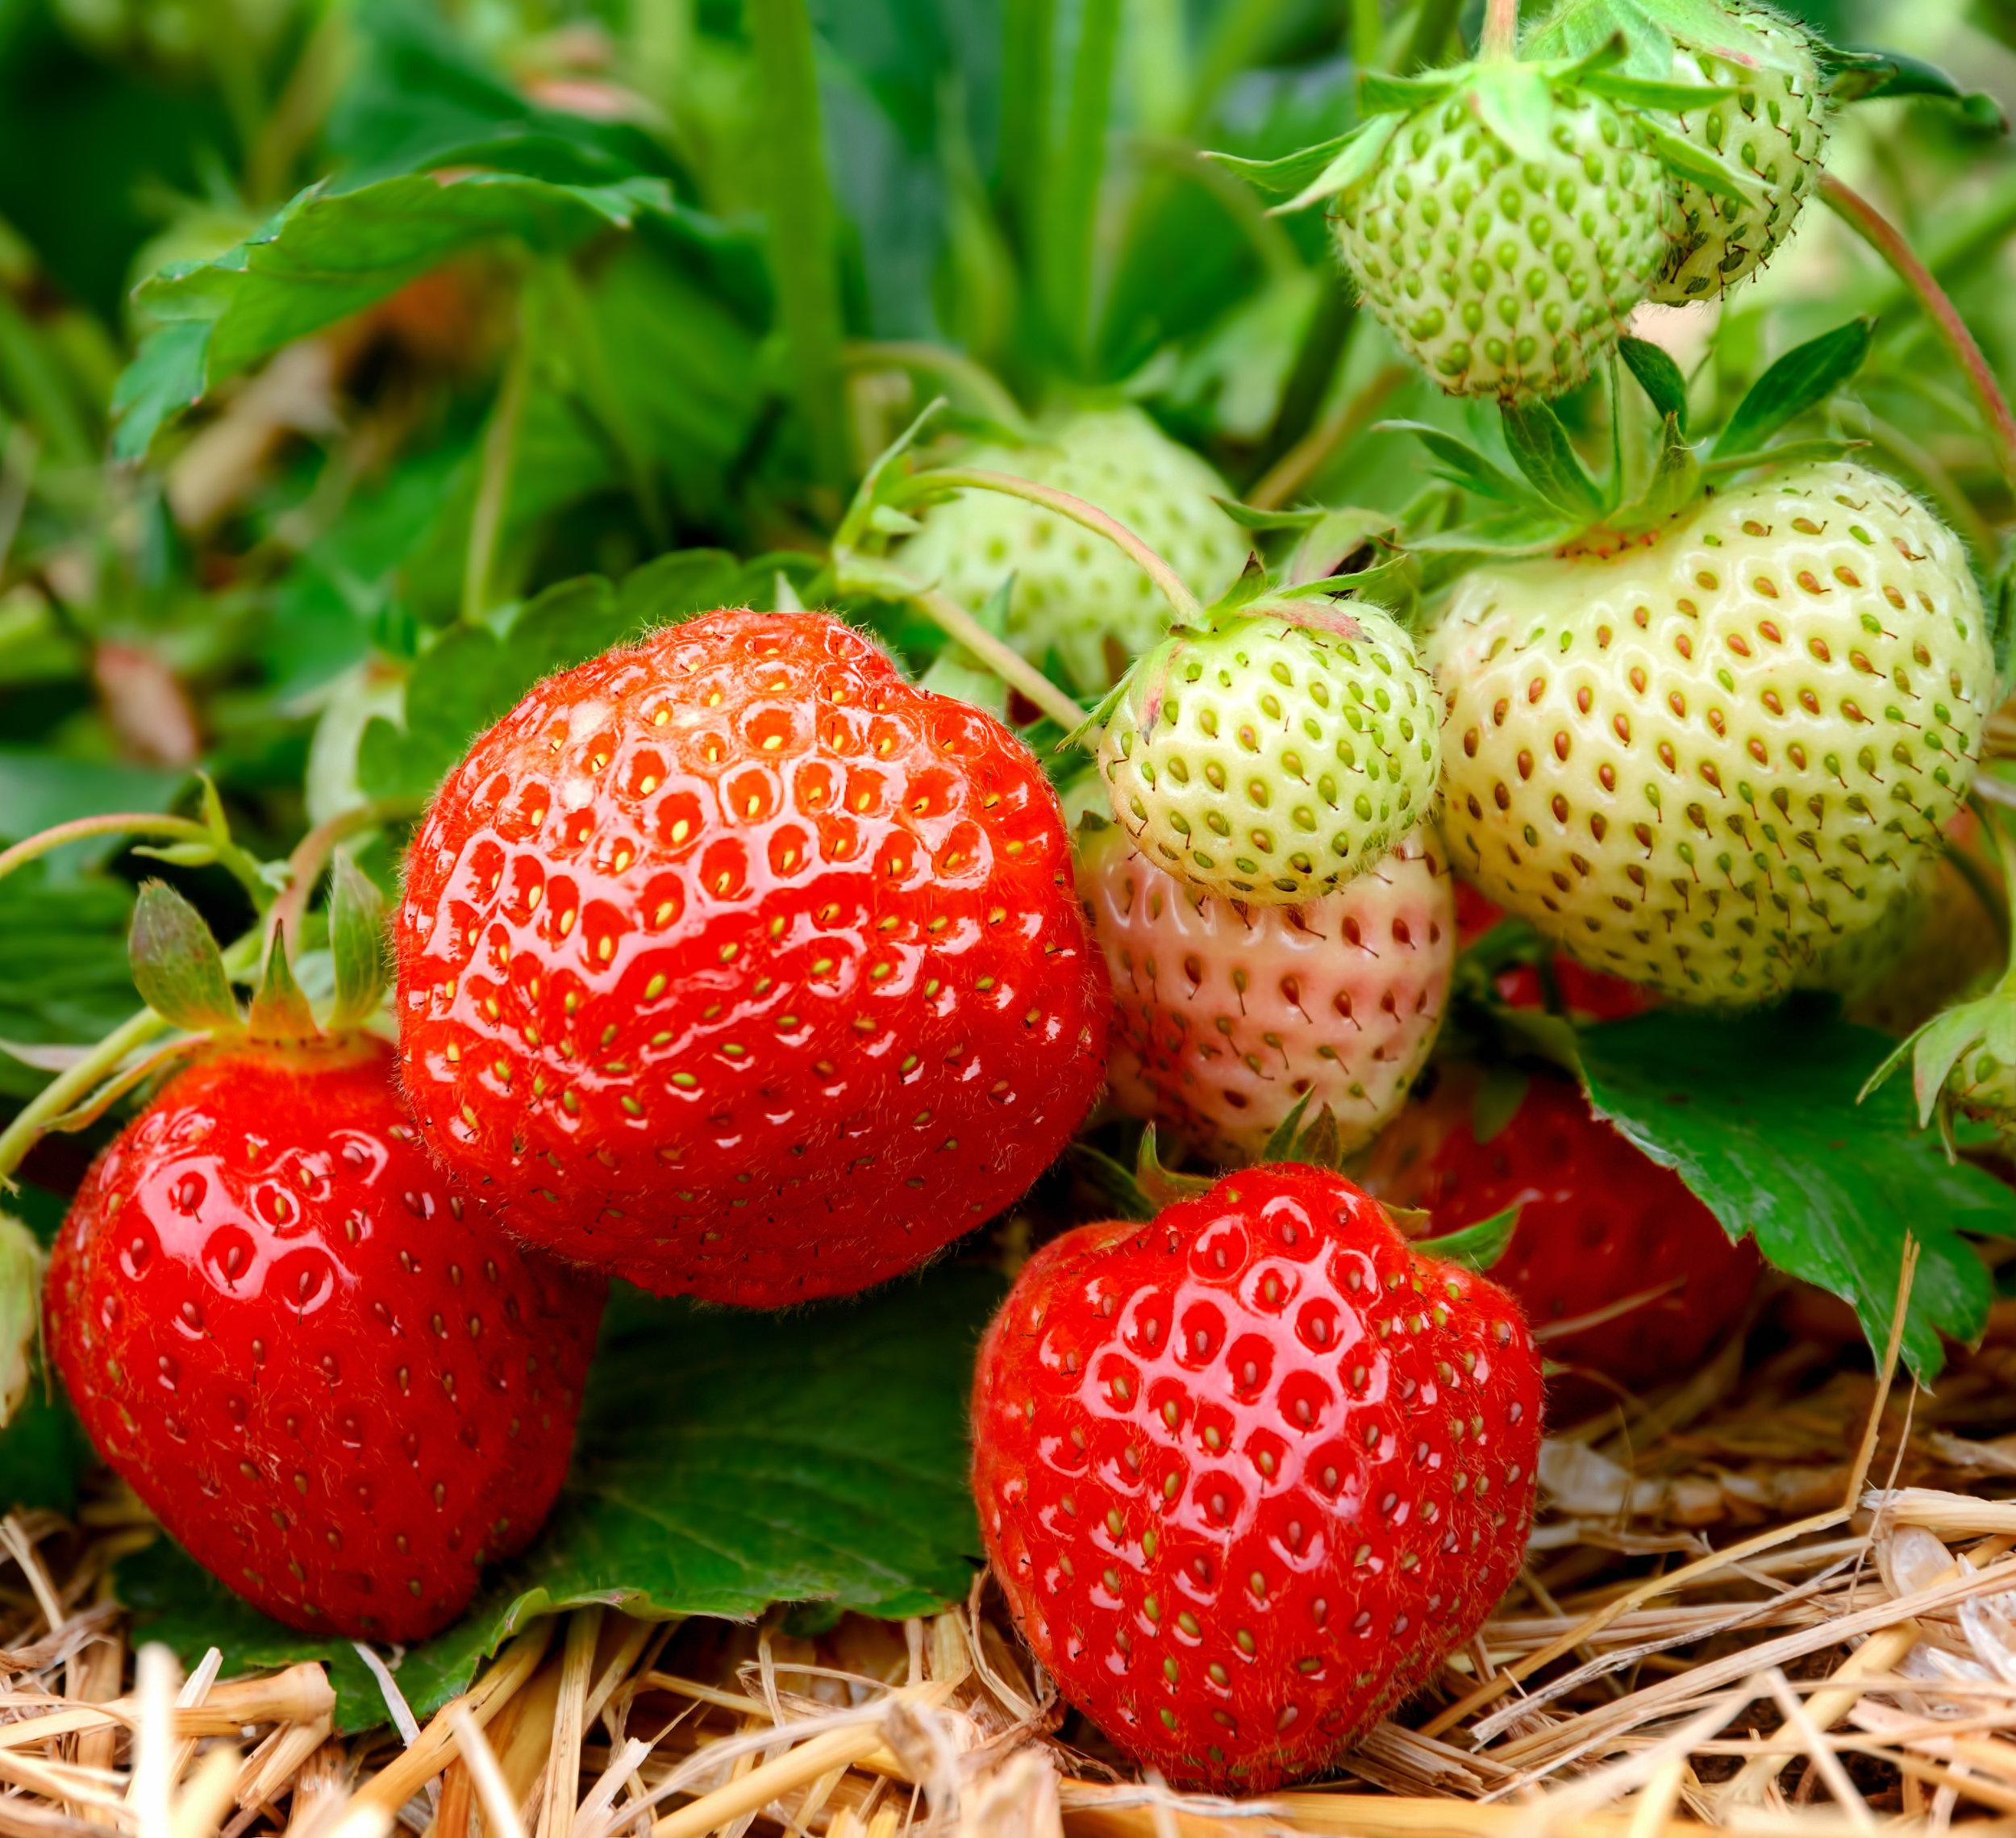 Strawberry Patch - shutterstock_185585858.jpg